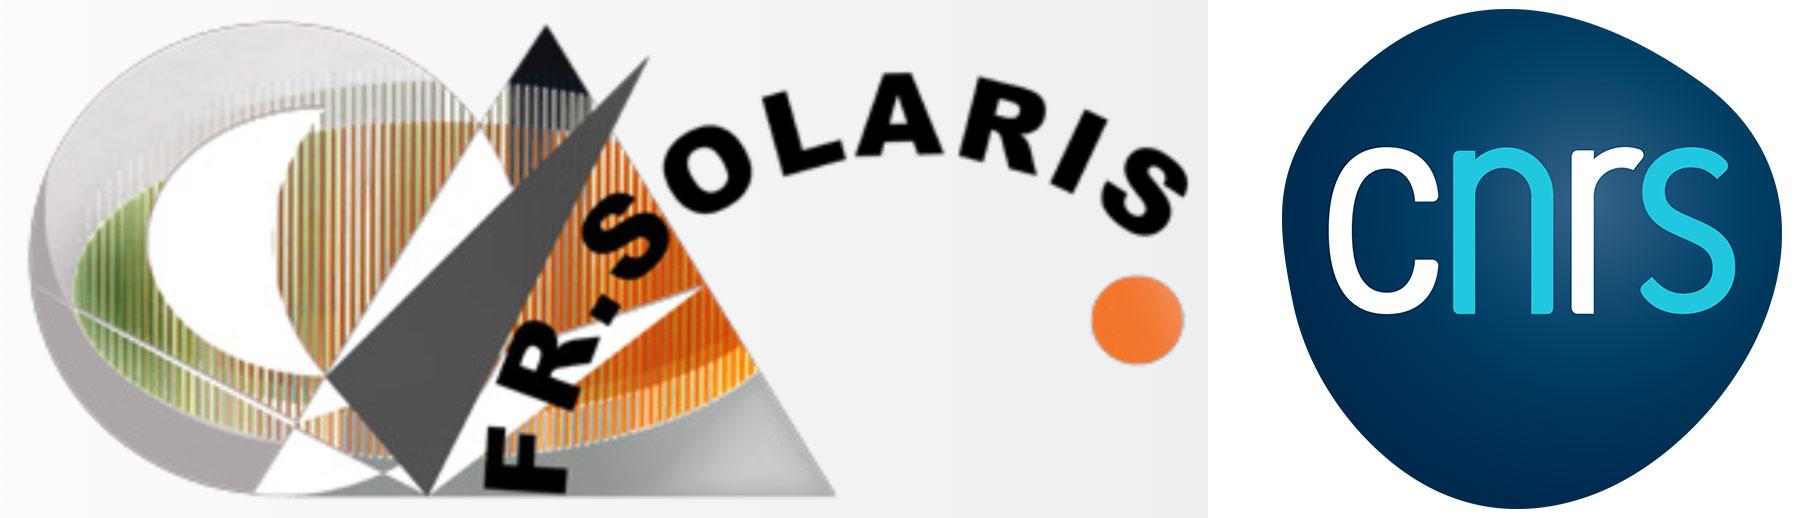 FR-Solaris – Infrastructure de Recherche